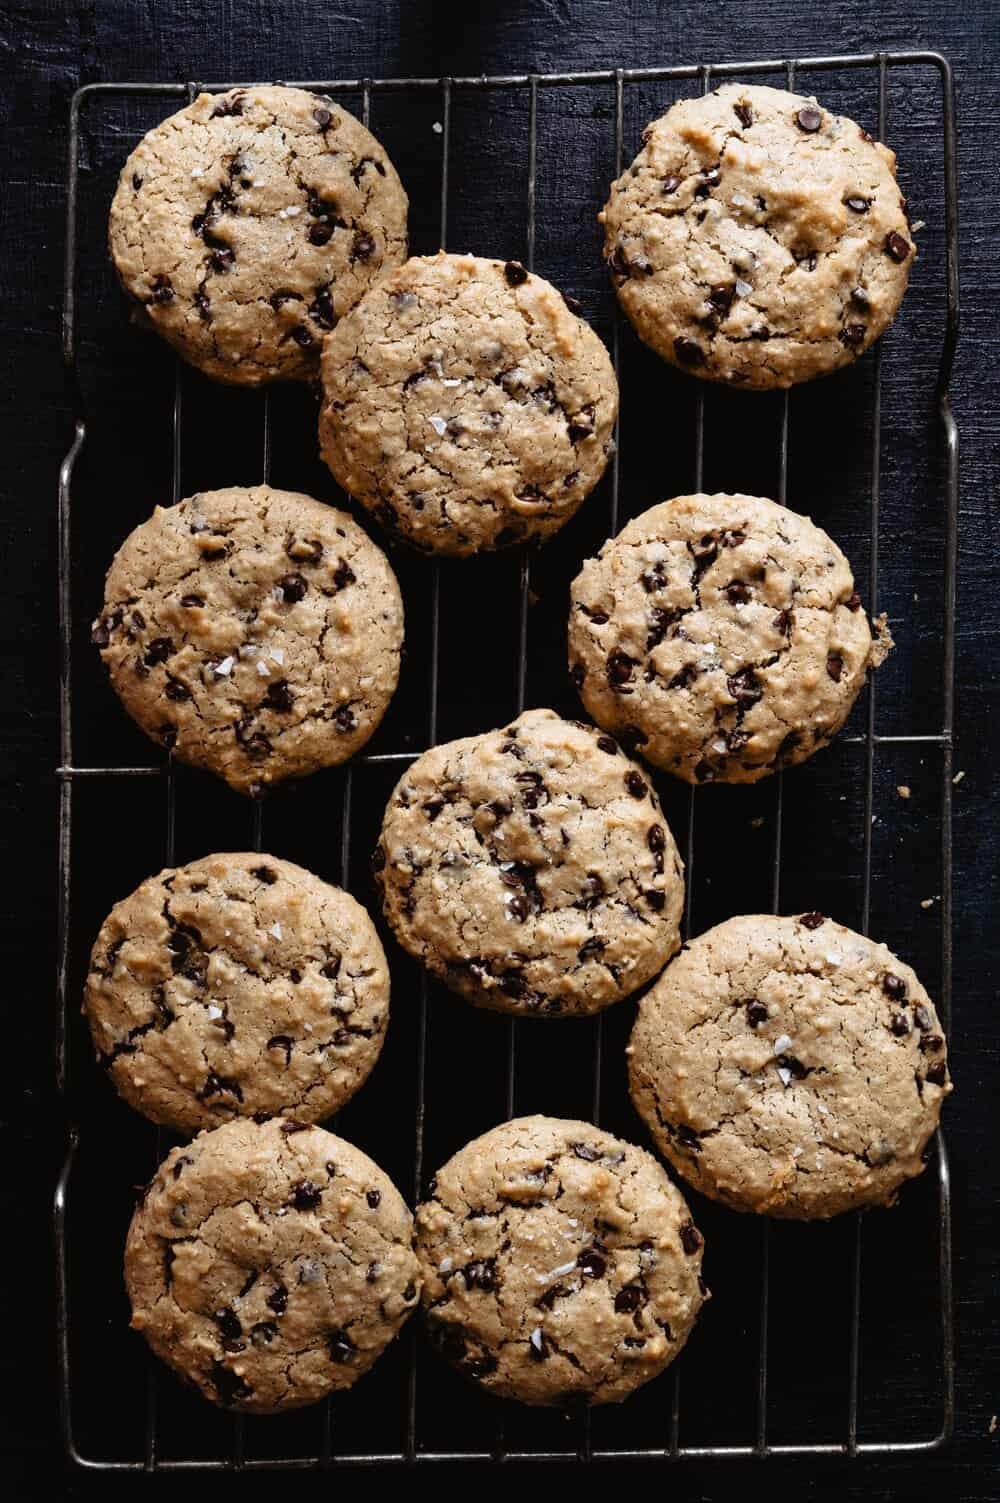 Life changing tahini chocolate chip cookies recipe by Nicole Modic.